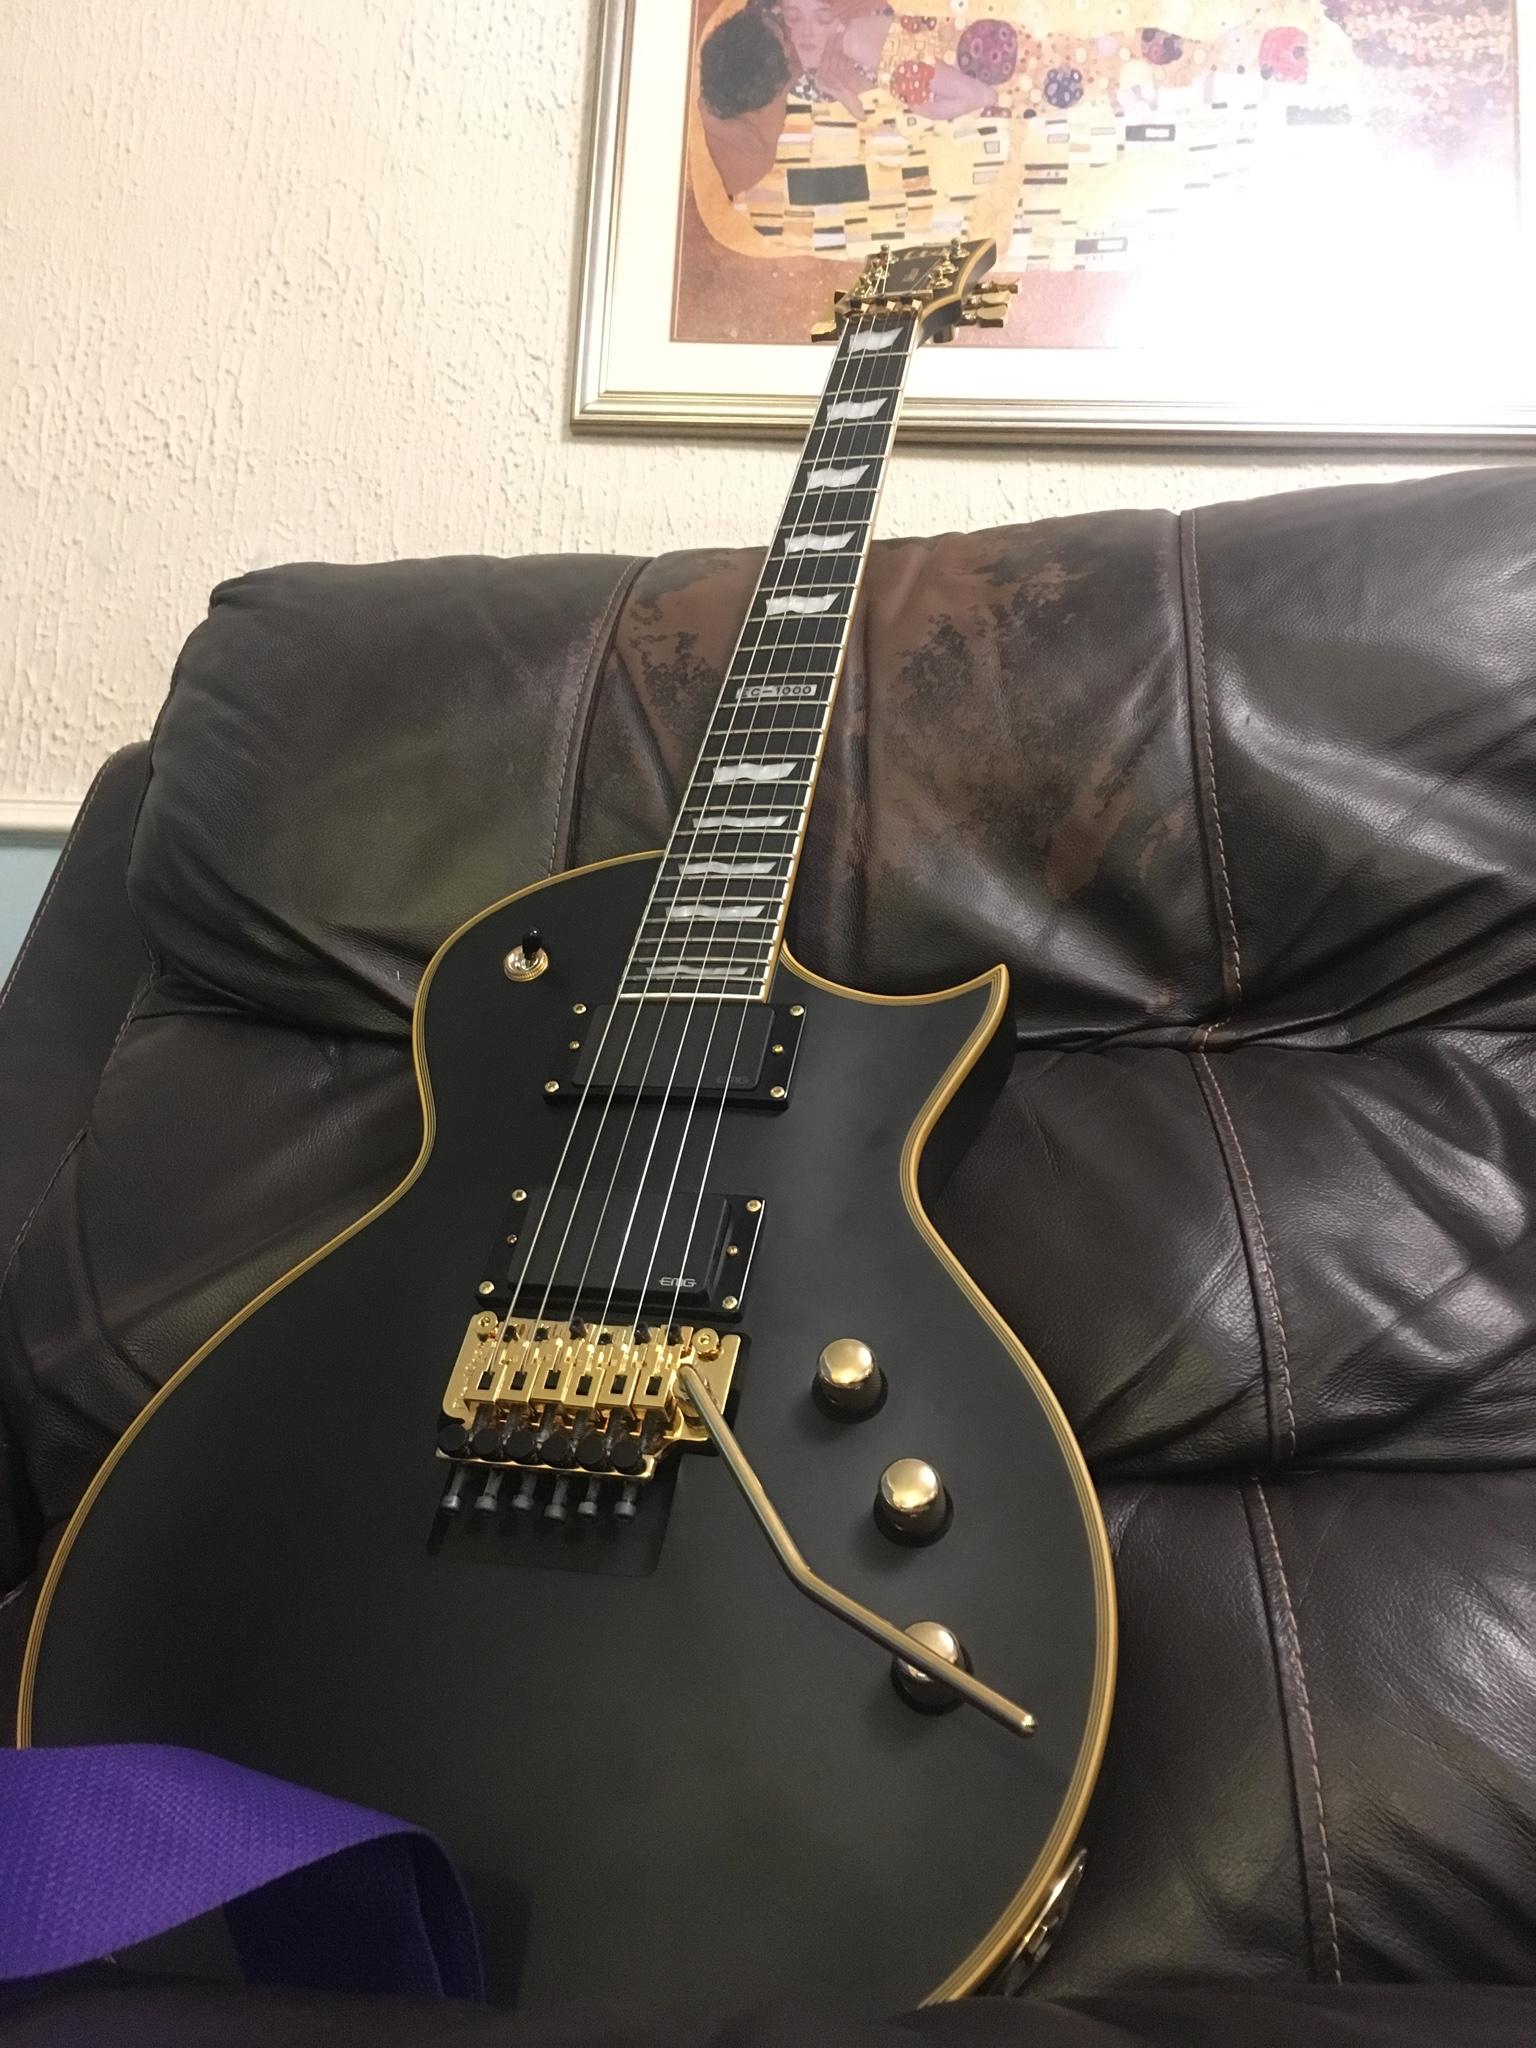 Ngd Ltd Ec 1000 Fr Jackson Guitar With Emg Pickup Wiring Mahogany Body Set Thru Neck 2475 Scale Length Ebony Fretboard 24 Frets Thin U Shape 81 60 Combo Vol Tone